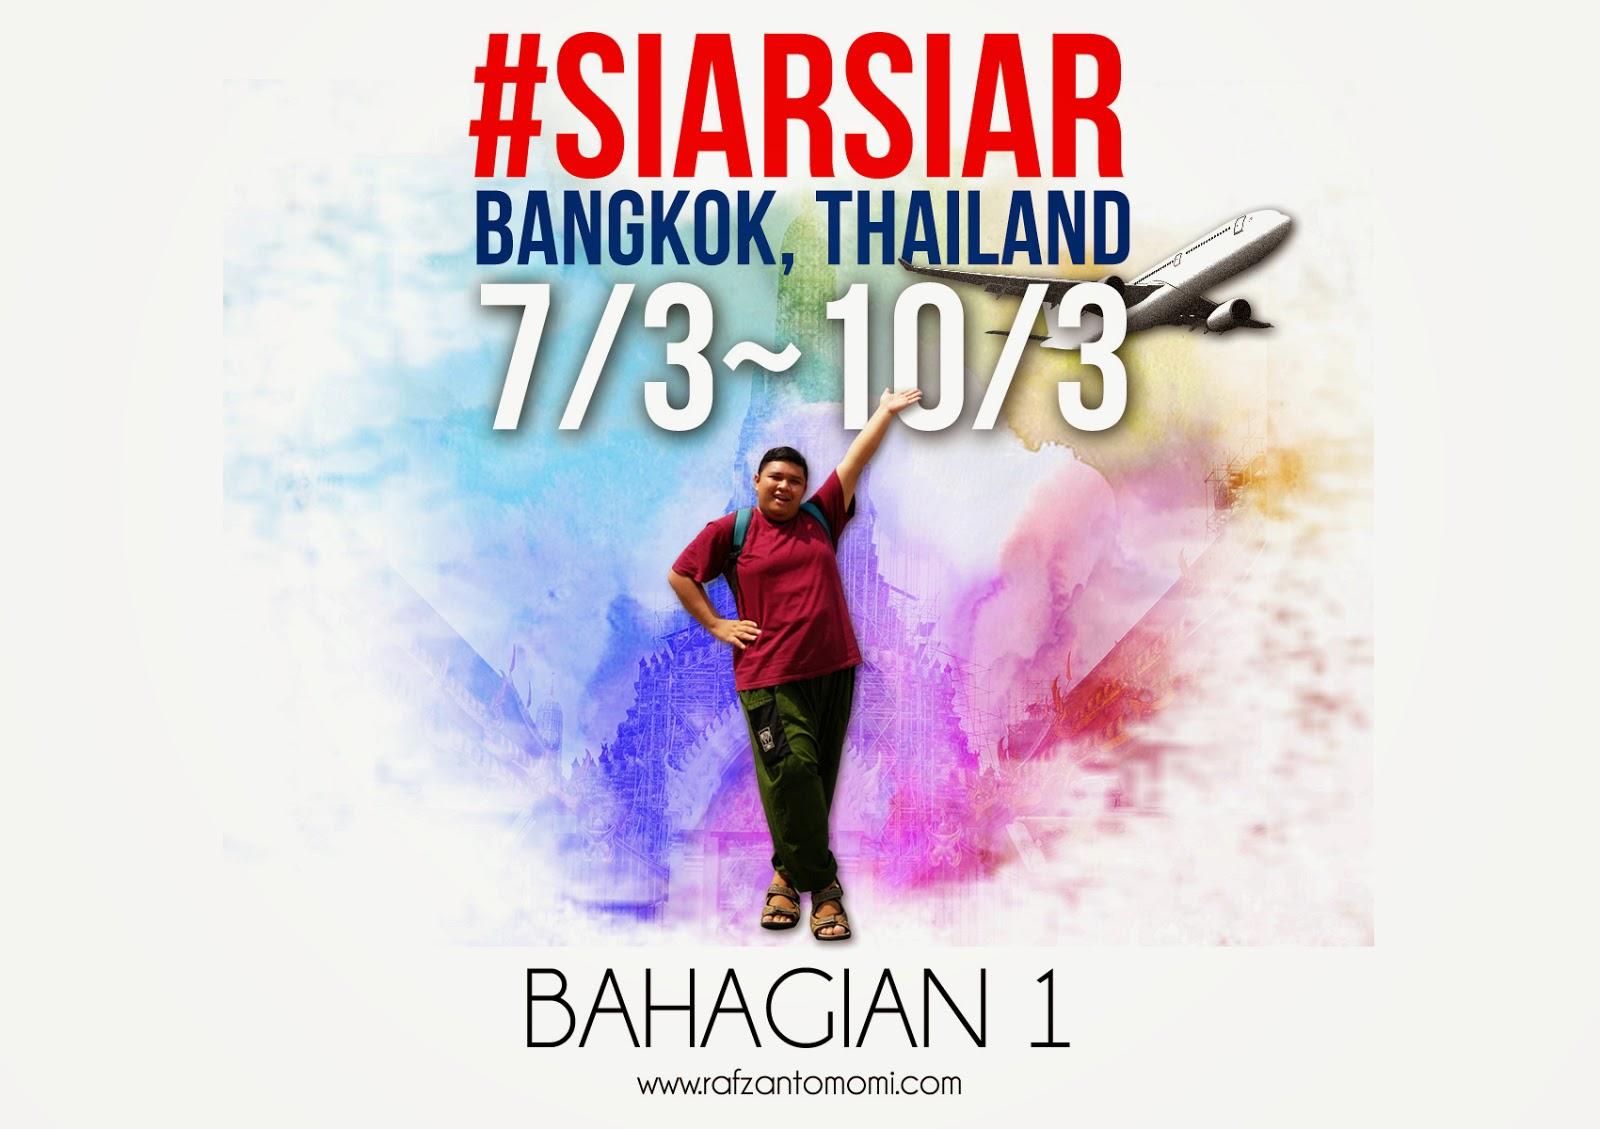 Siarsiar Bangkok Thailand 7 3 10 3 Bahagian 1 First Flight